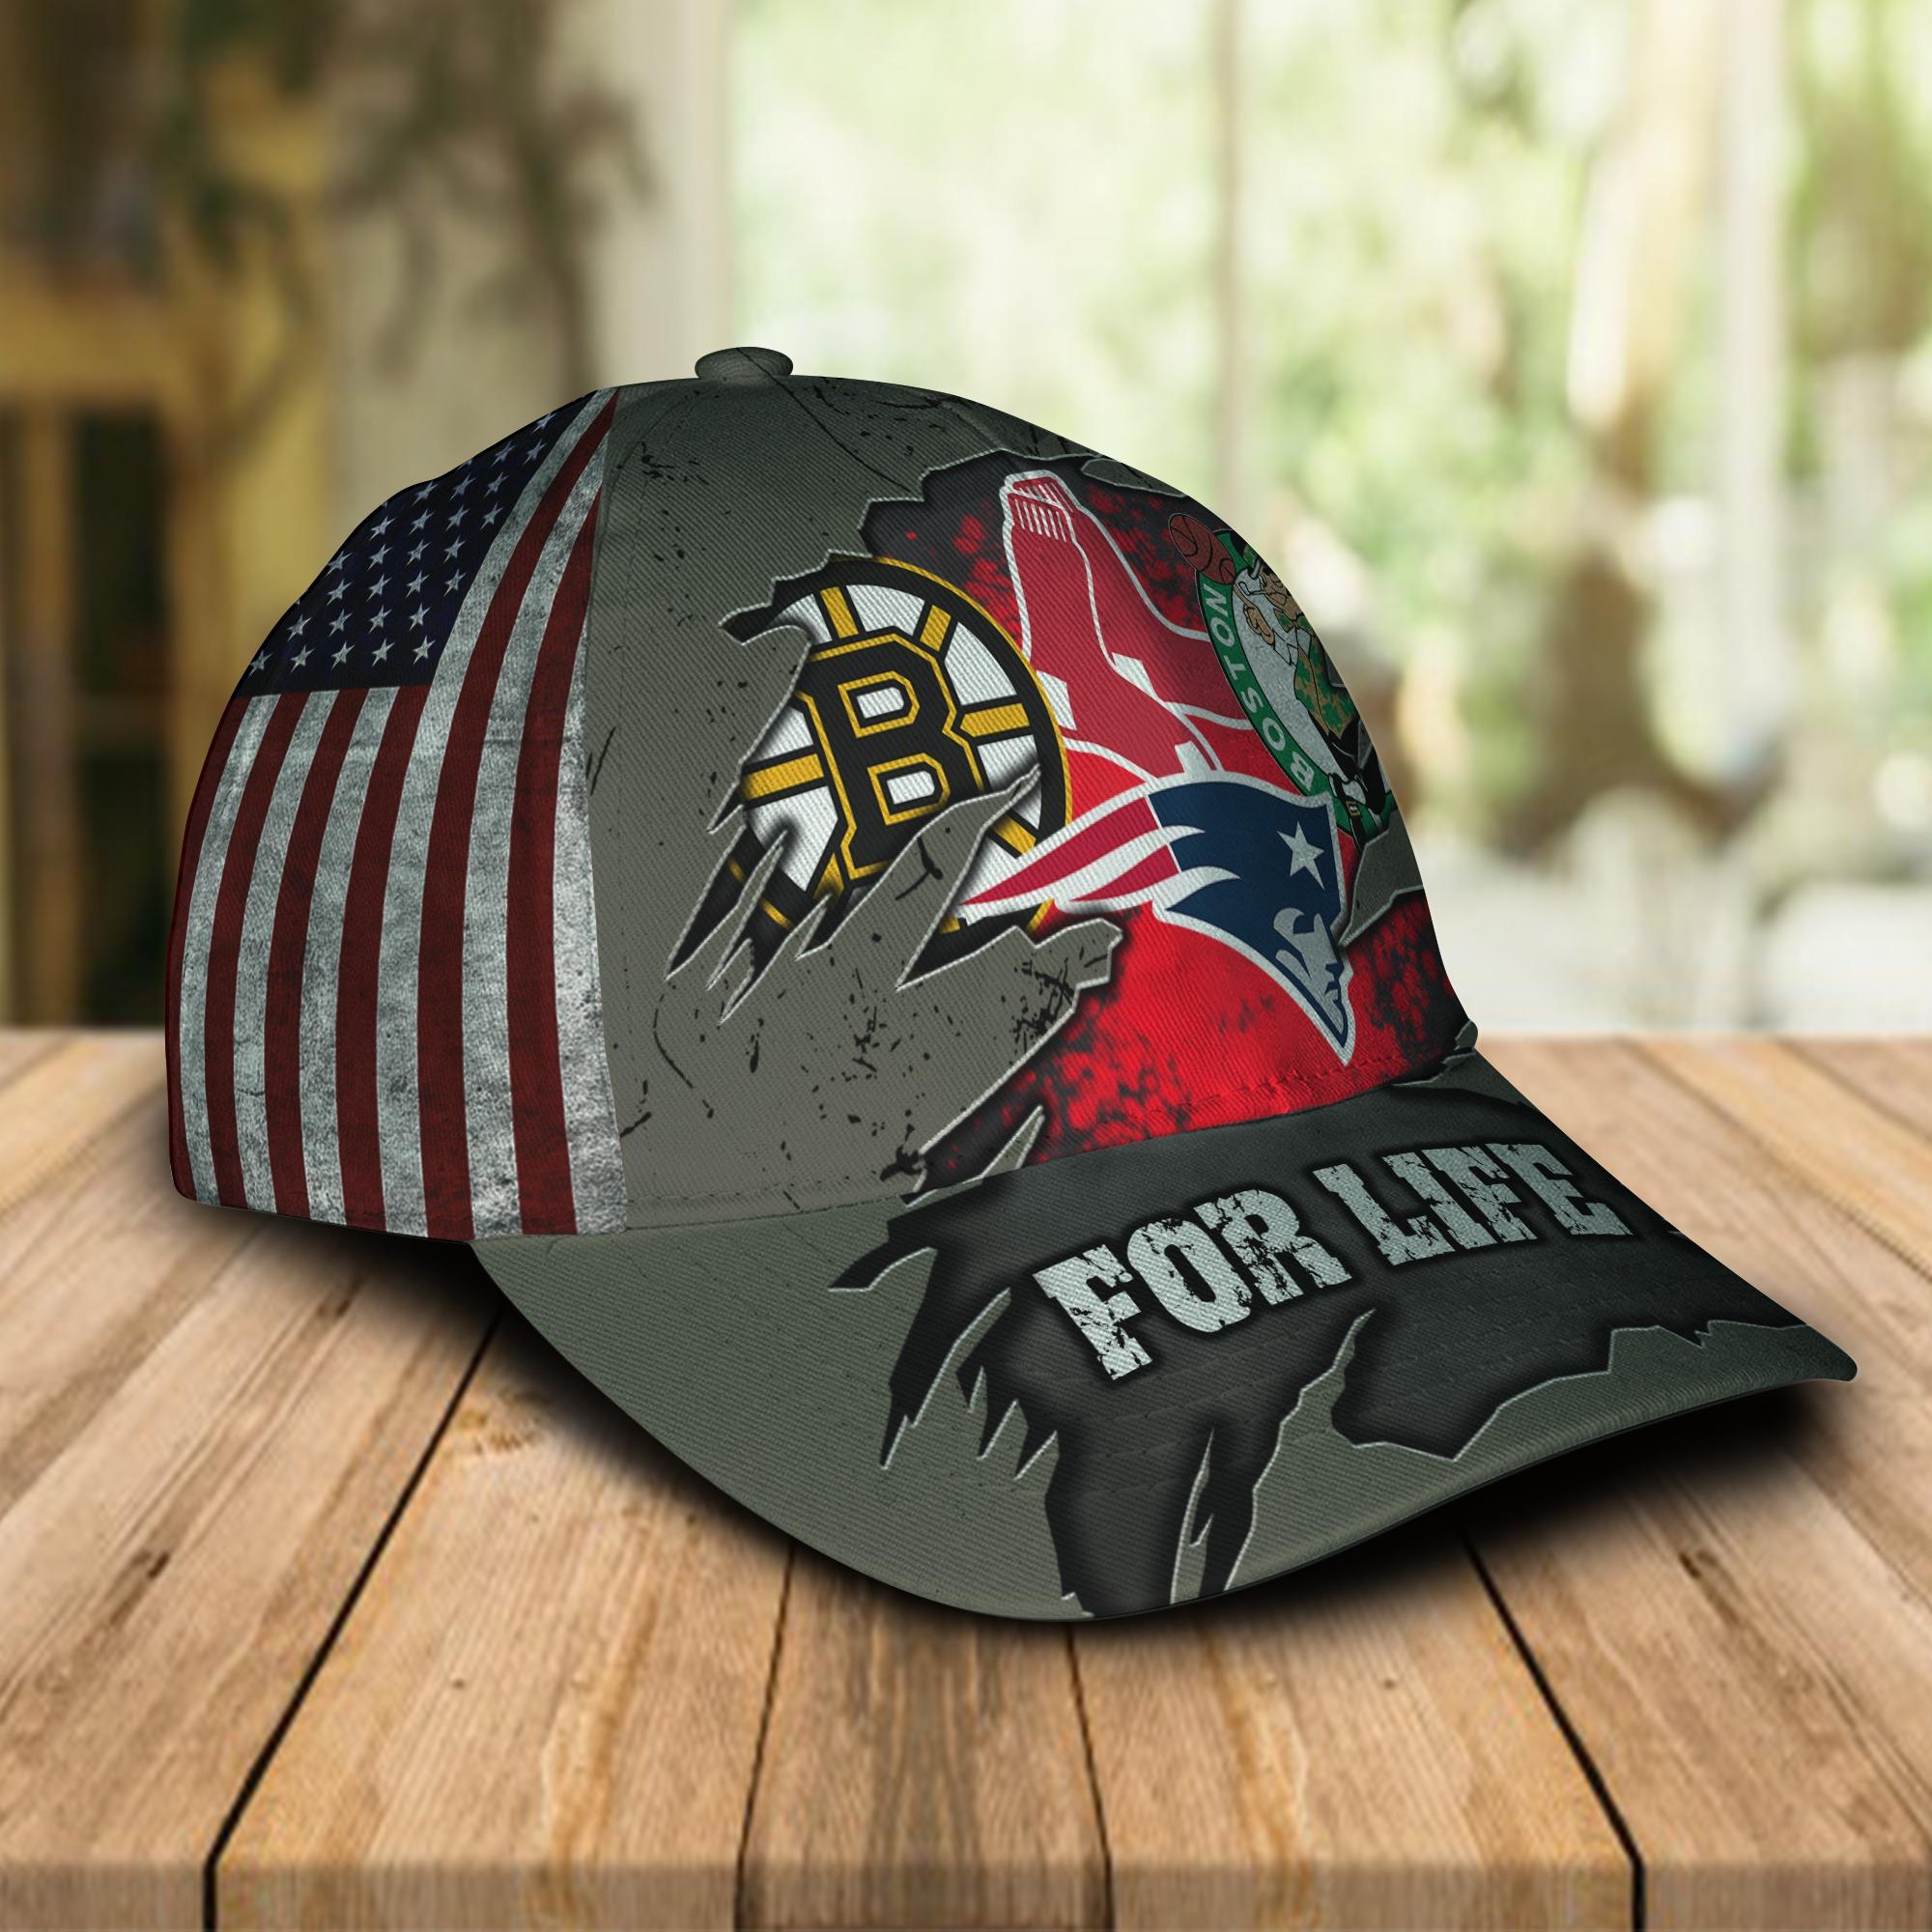 Boston celtics new england patriots boston bruins boston red sox for life cap 1